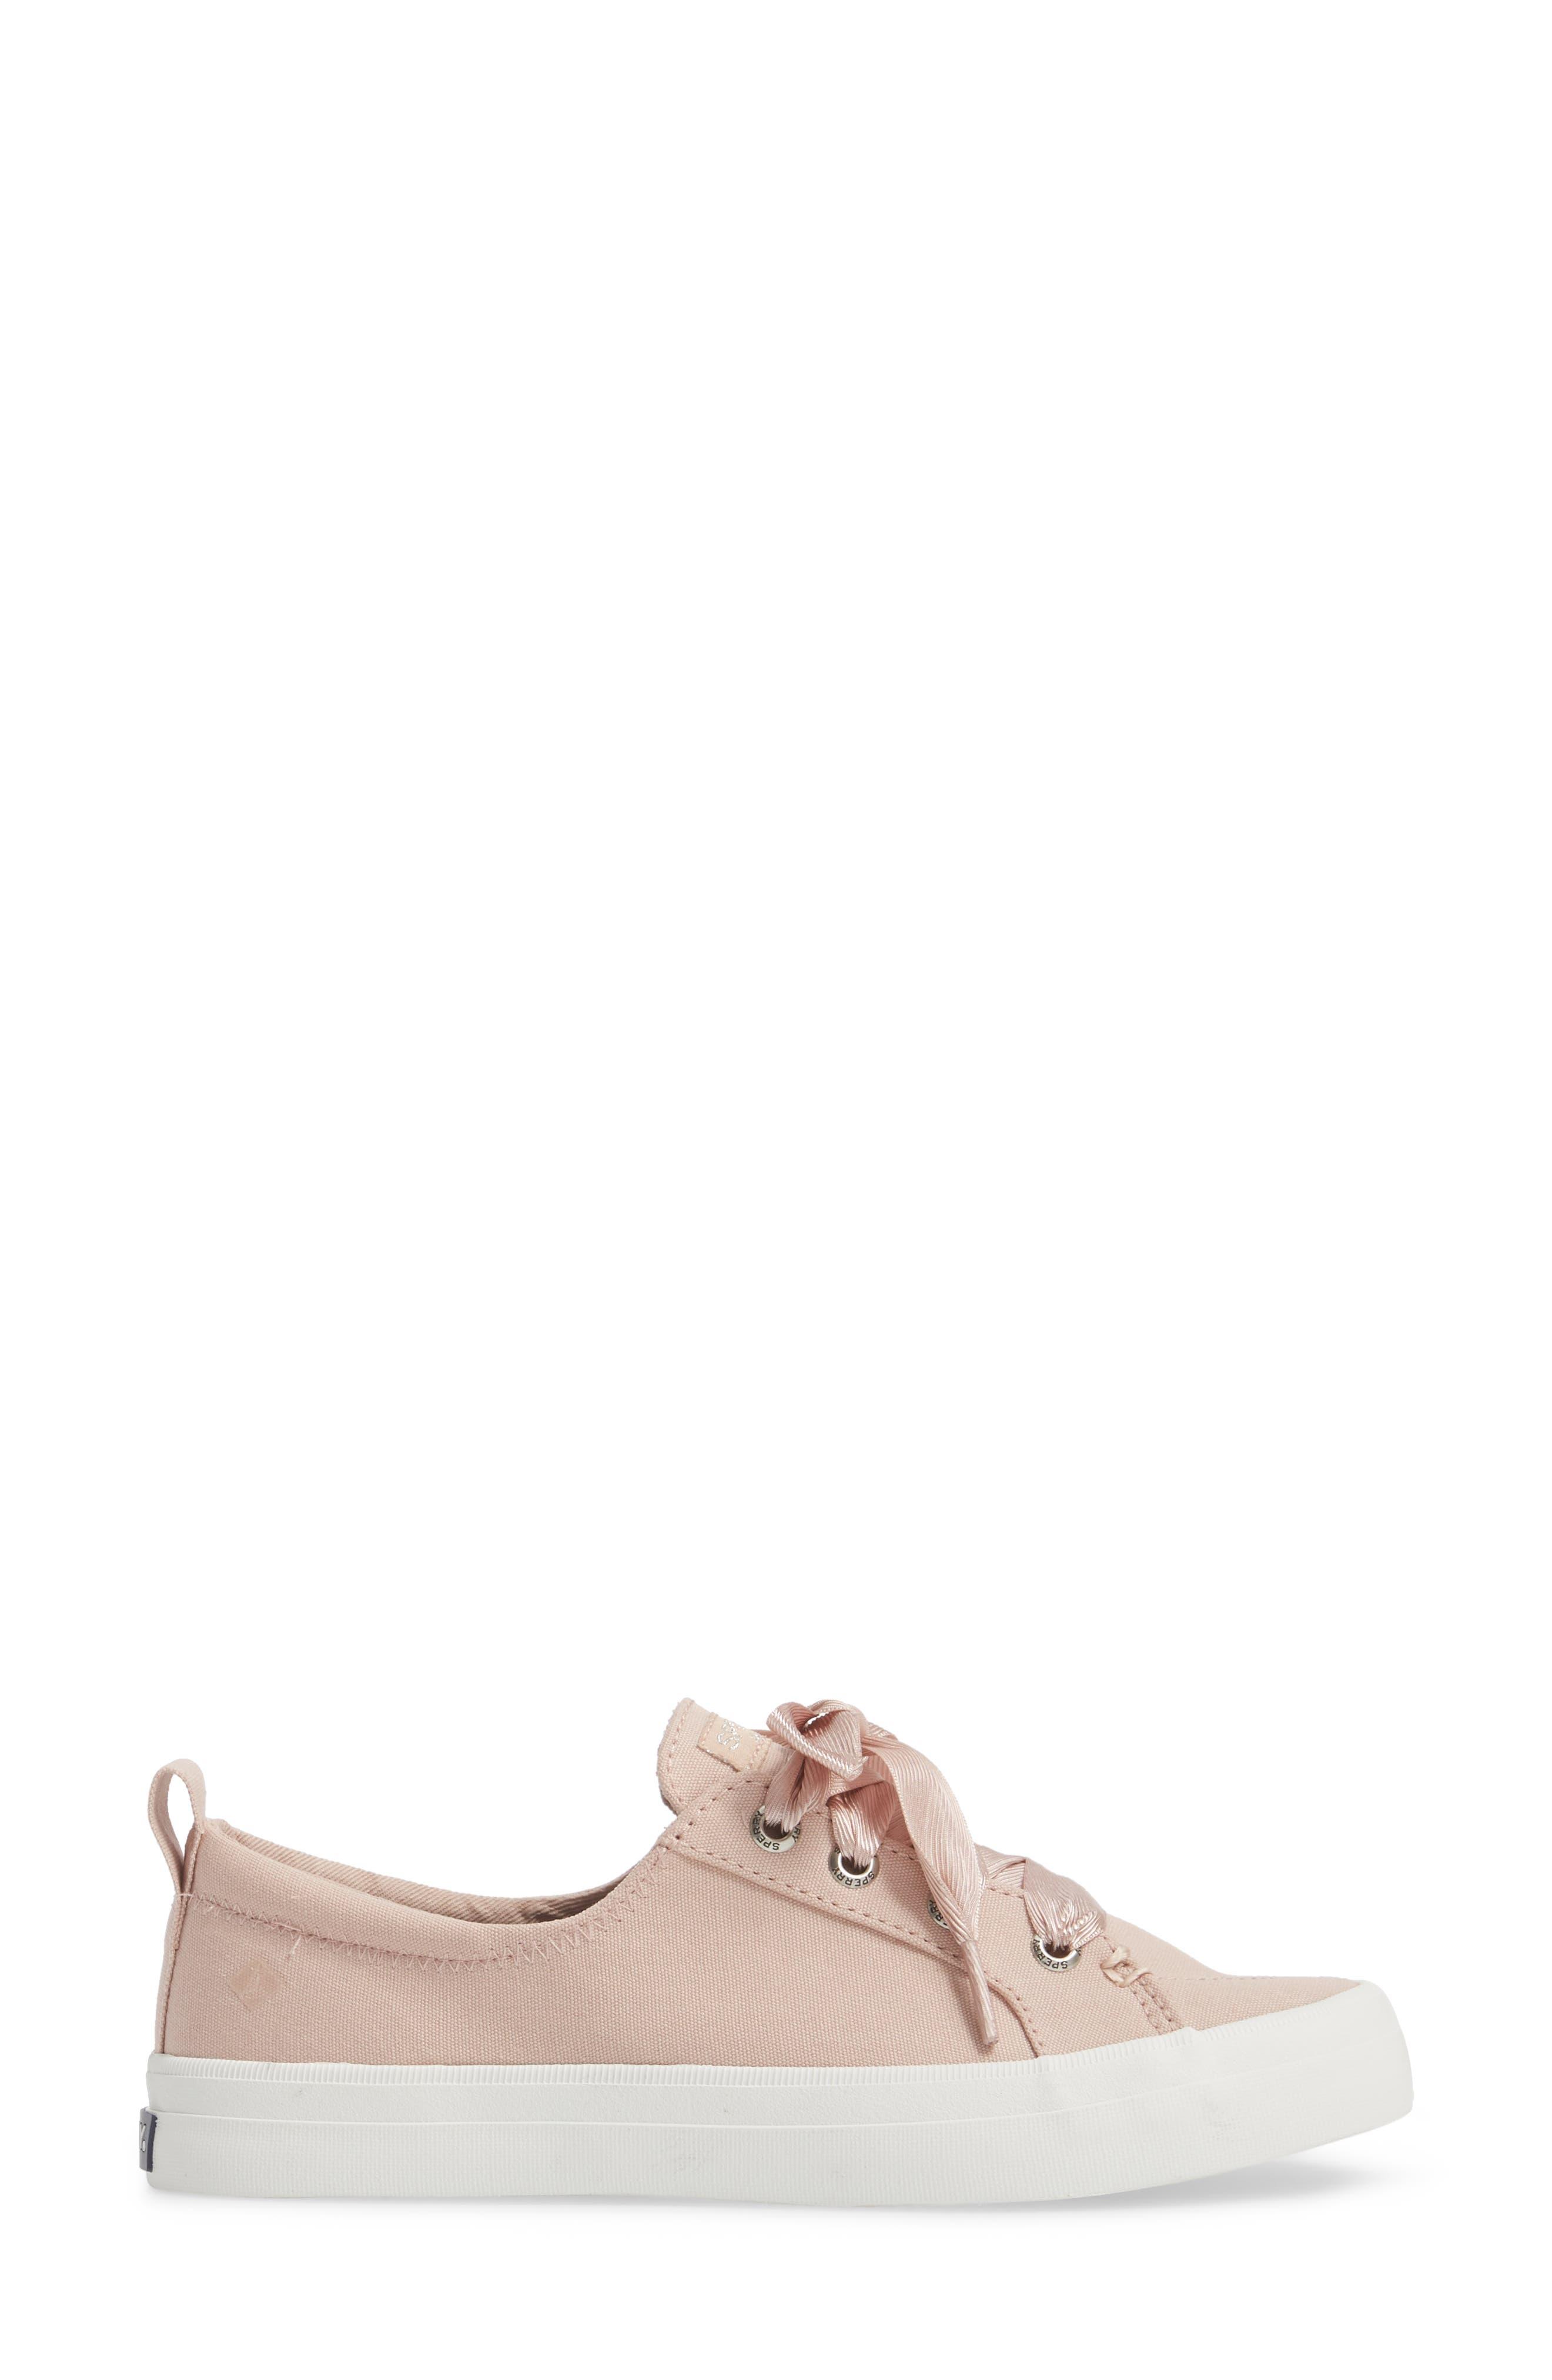 Crest Vibe Satin Lace Sneaker,                             Alternate thumbnail 3, color,                             Rose Dust Canvas